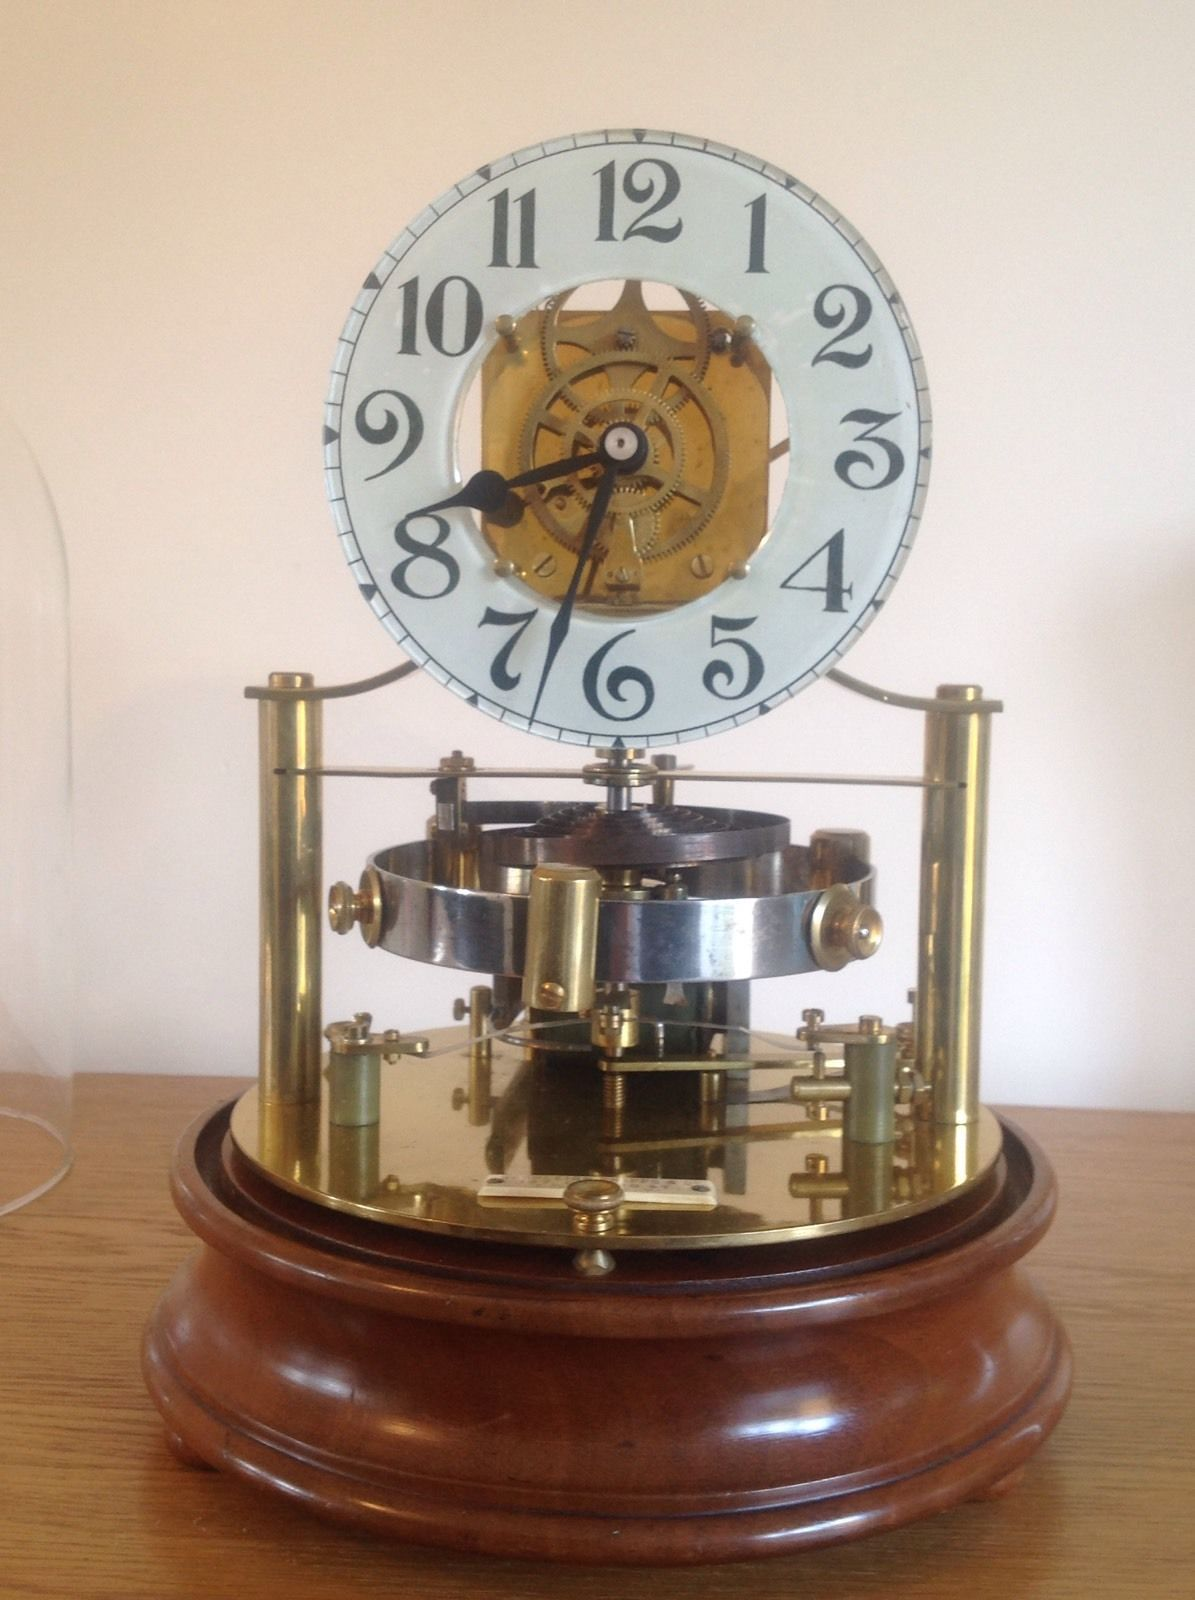 Murday Reason Electric Clock Utilising Hipp Toggle Switch And Solenoid To Provide Impulse Kick The Large Horizontally Electric Clock Antique Clocks Desk Clock